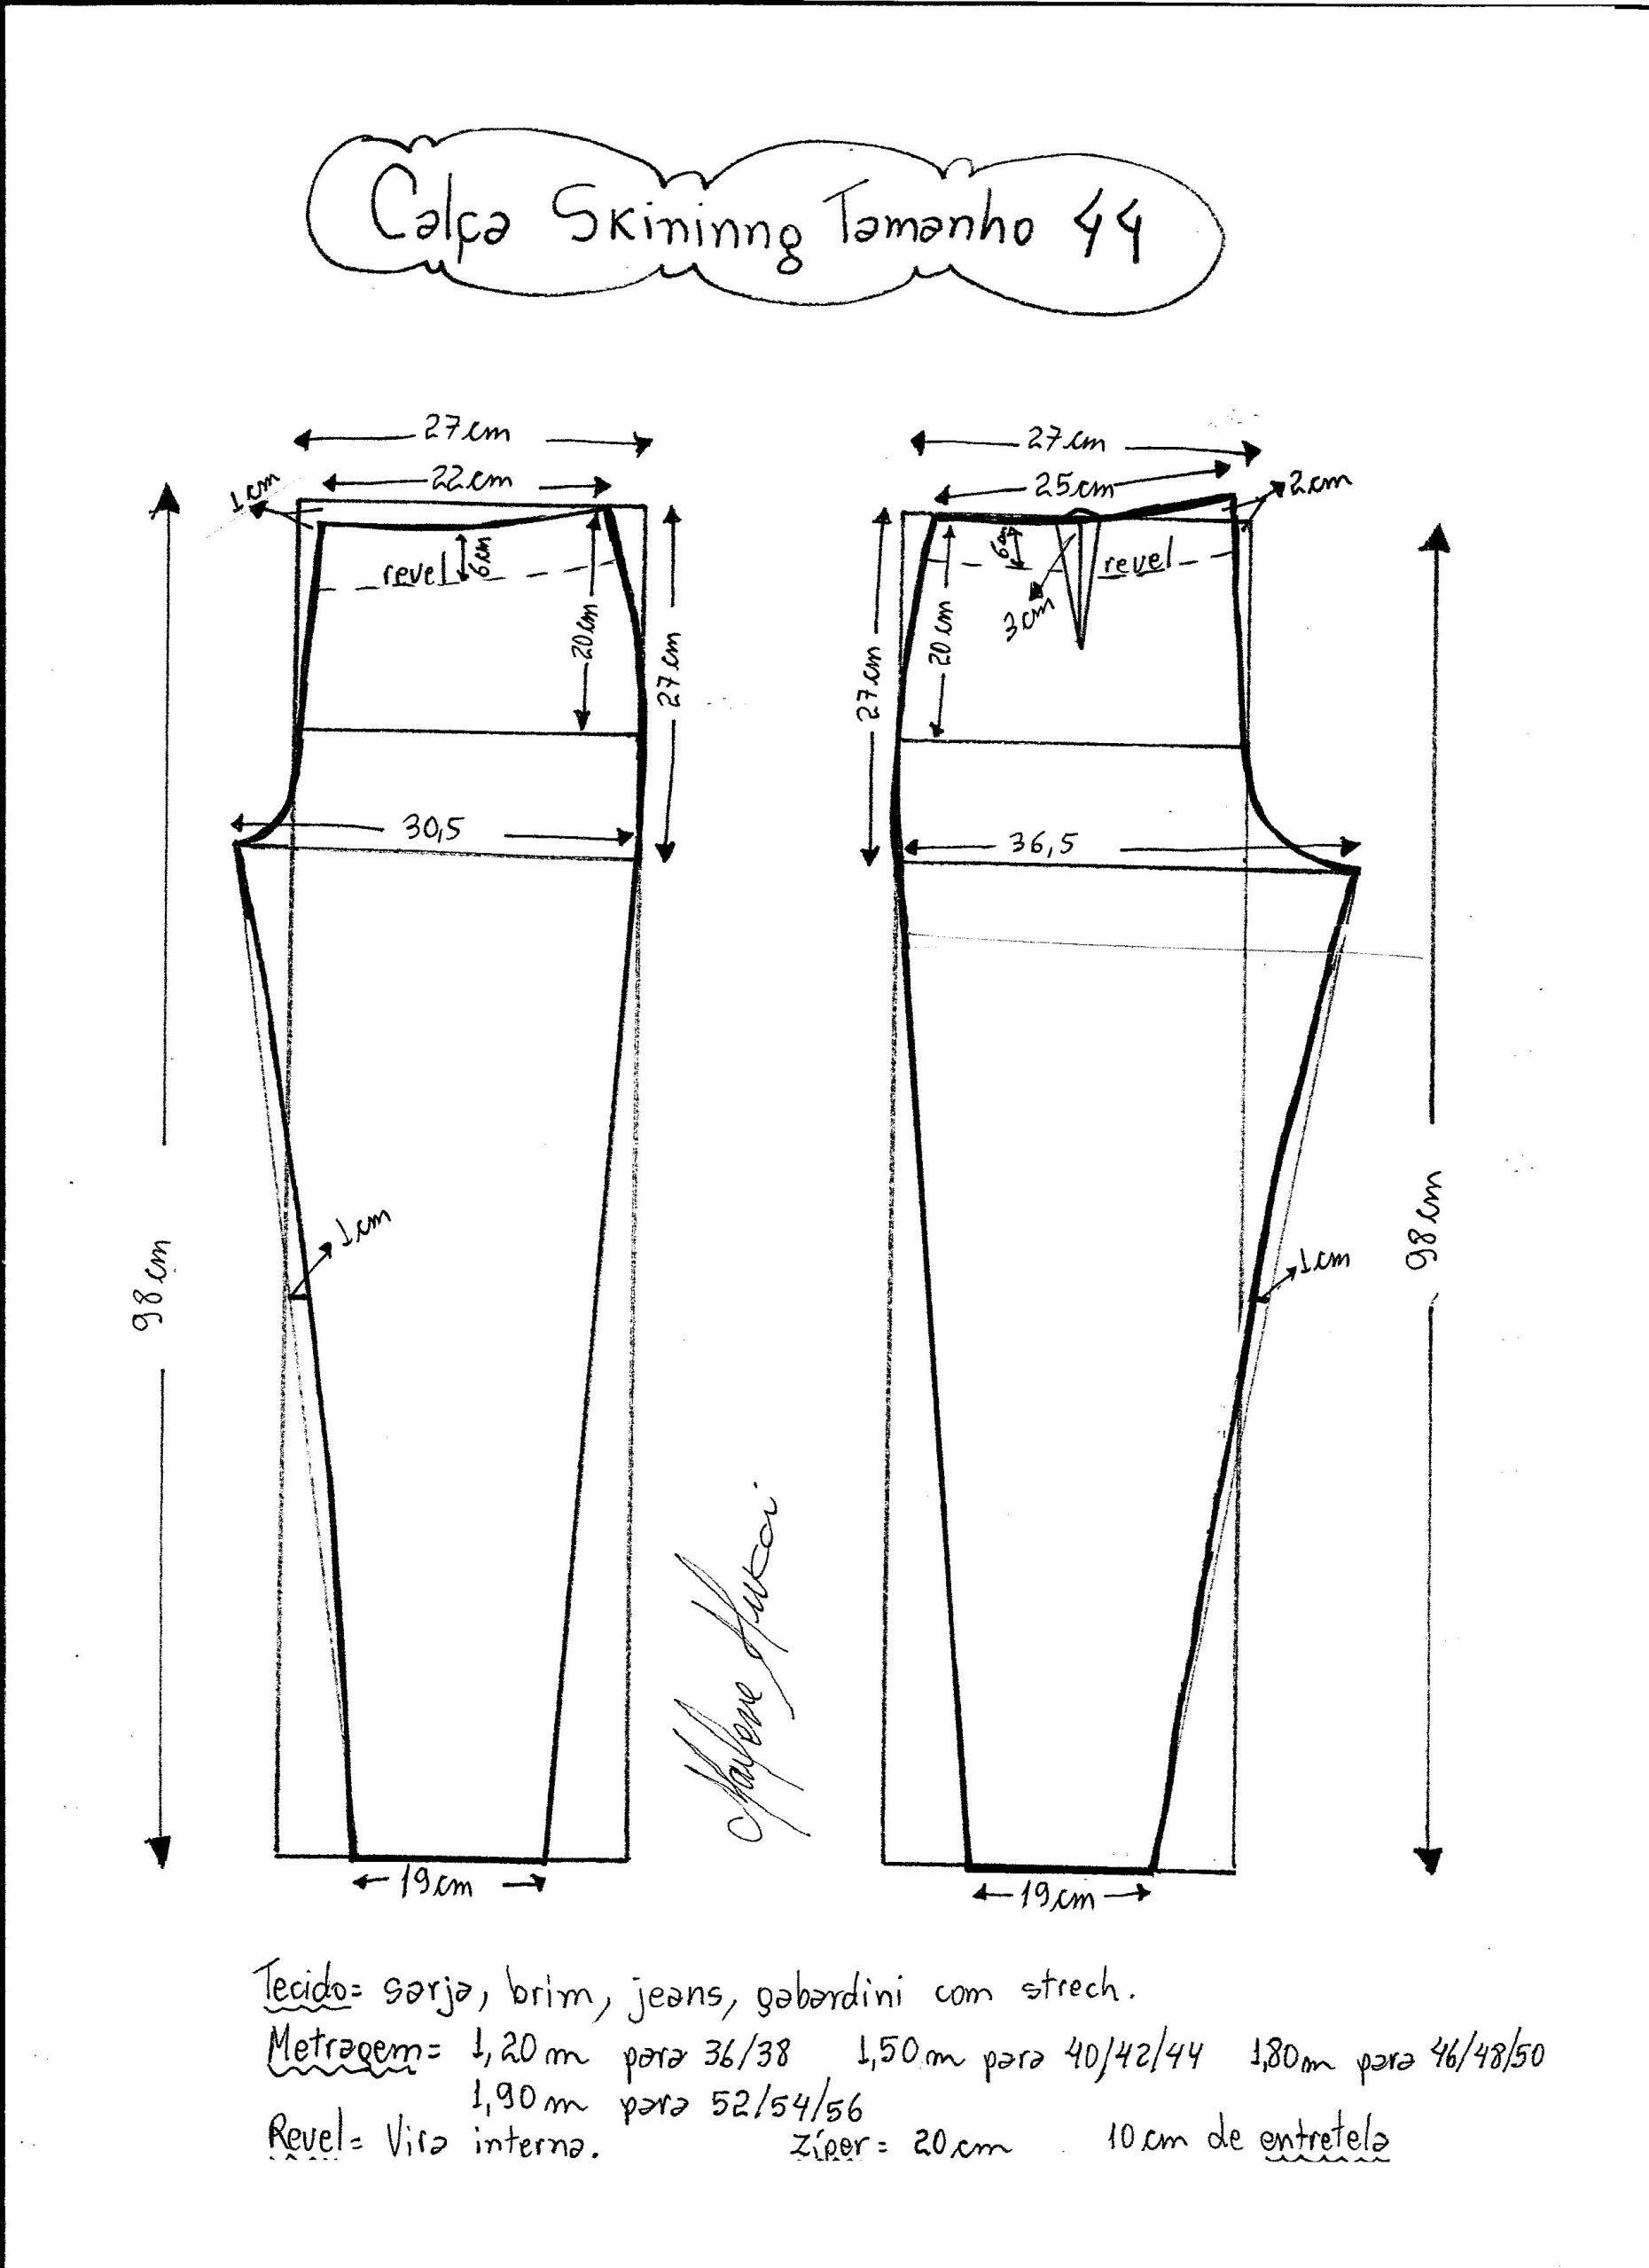 Esquema de modelagem de calça skinny tamanho 44. Szabásminták Ingyen a972688aff